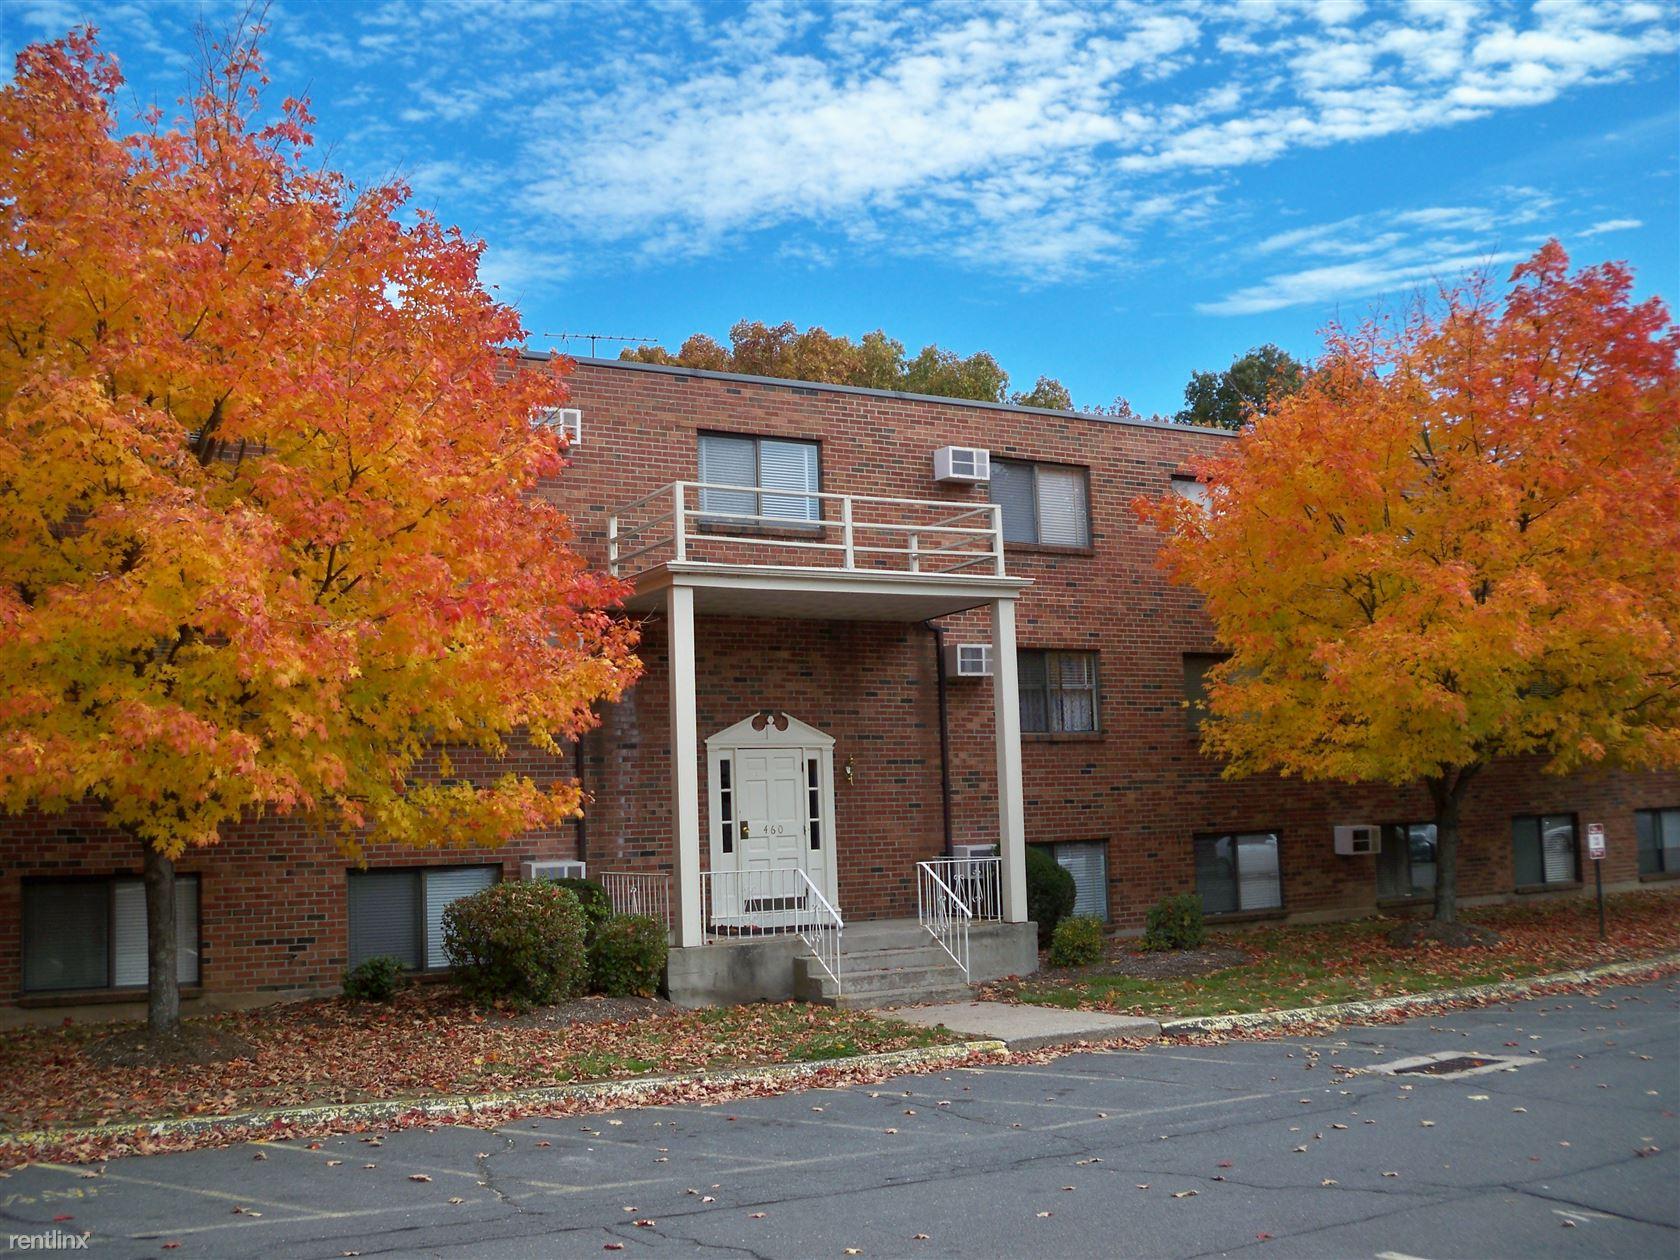 241 Redstone Hill Rd, Bristol, CT - $870